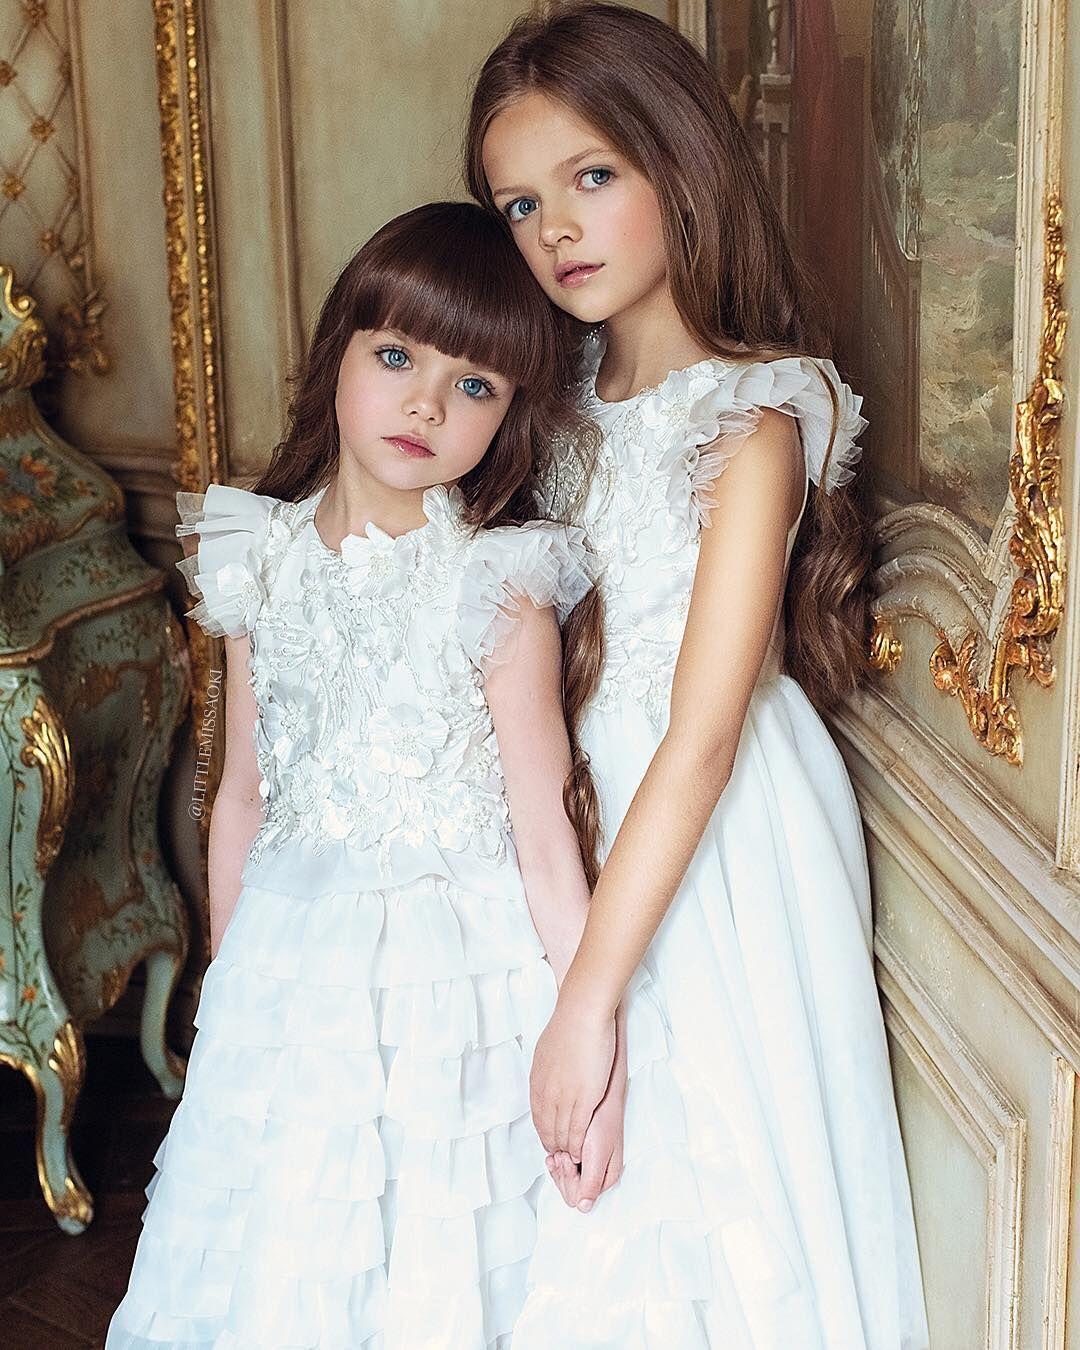 f72f0ebecf39b0 Little Miss Aoki  littlemissaoki Instagram Beautiful Anastasiya and Milena  in  littlemissaoki dresses 💐🌸💕 A diffusion line of  MischkaAoki - Av..